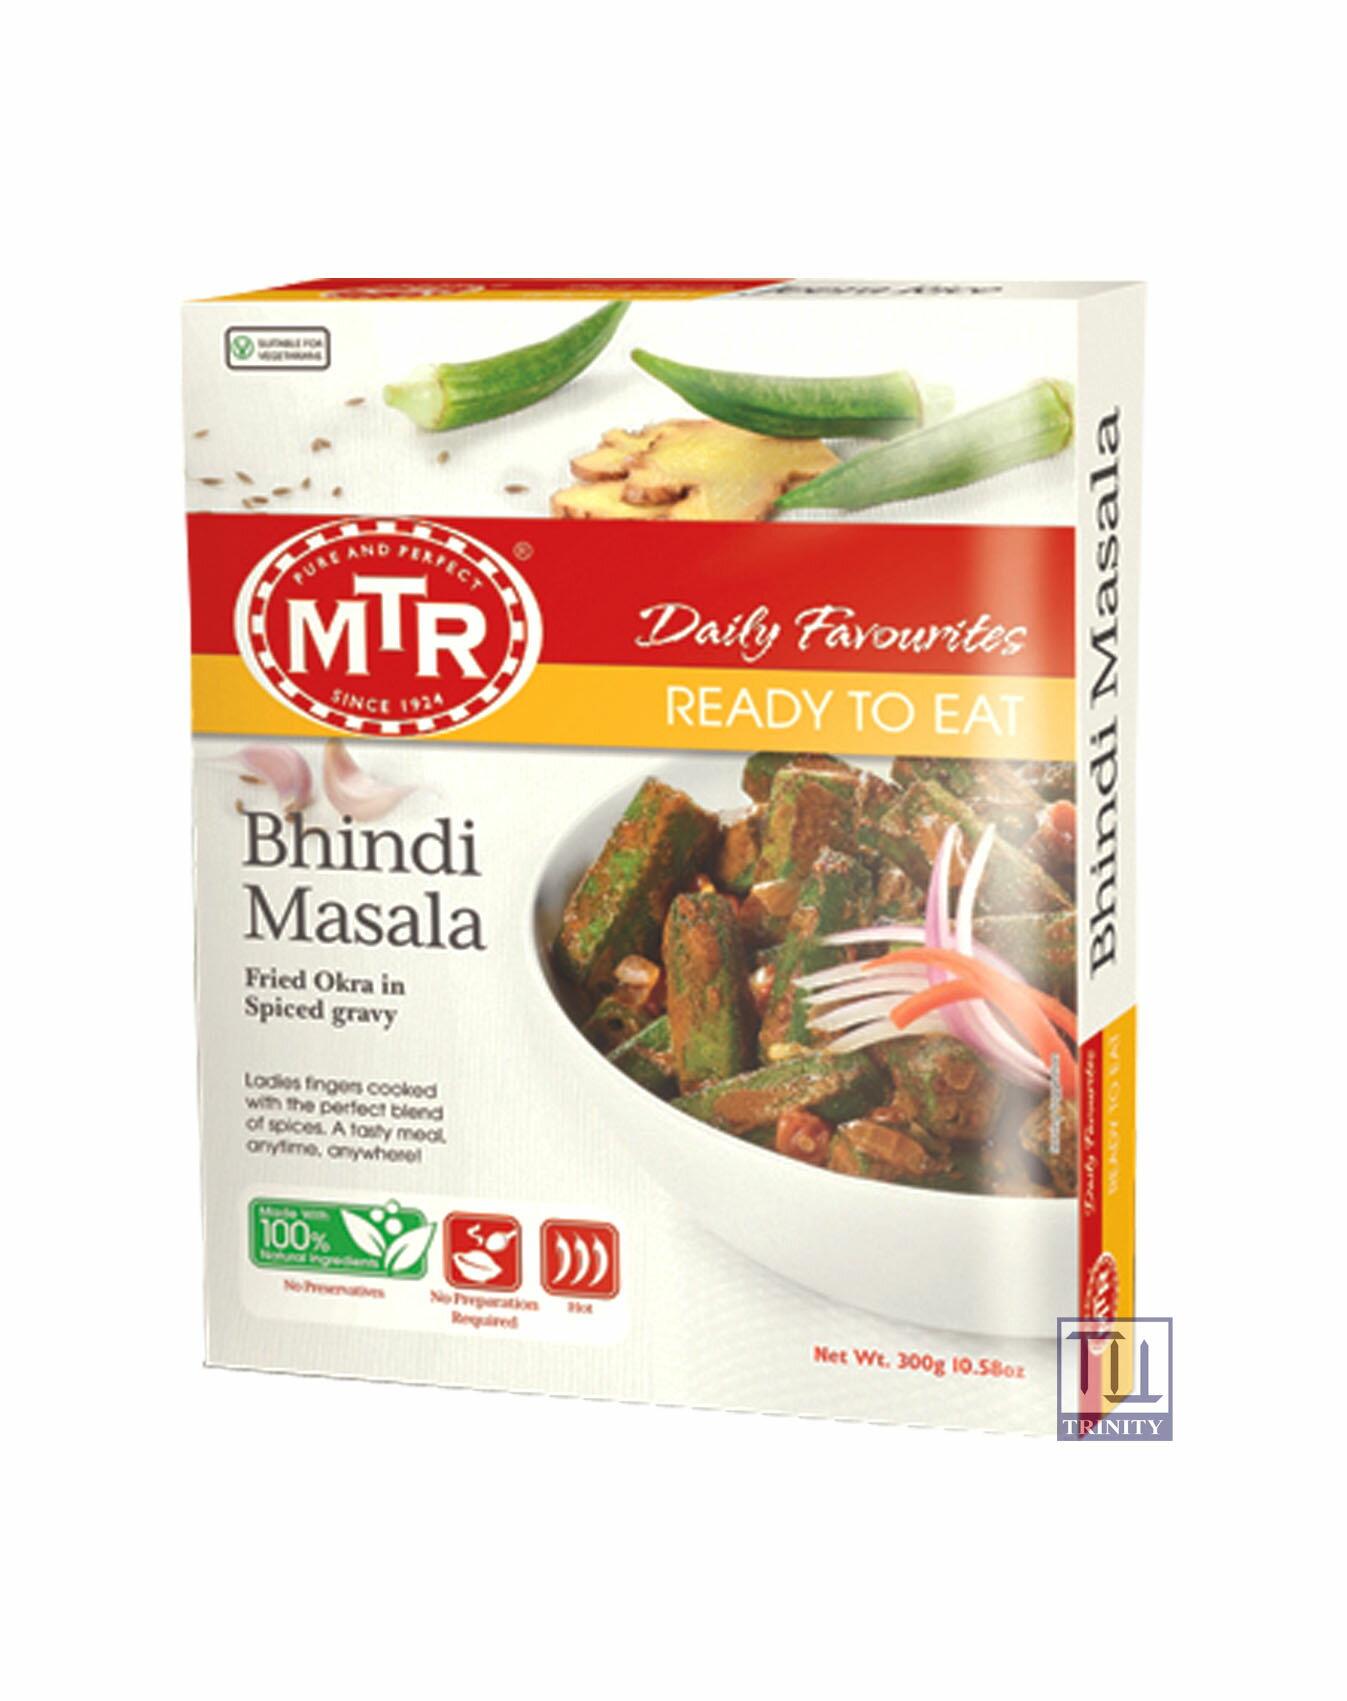 Mtr Bhindi Masala 印度秋葵咖哩即食調理包